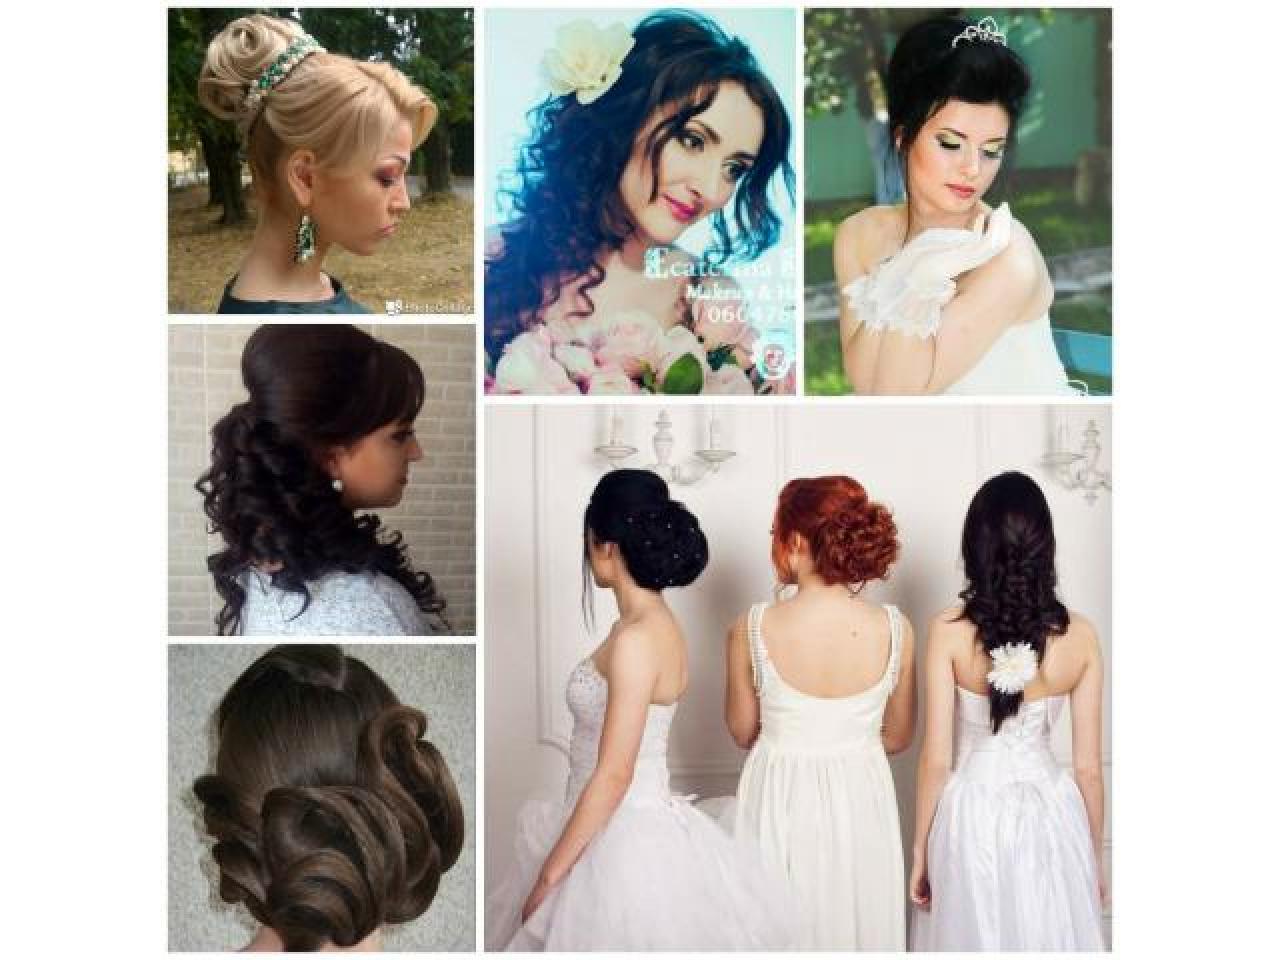 макияж, прически, наращивание ресниц. Makeup, Hairstyle, Eyelash extensions - 6